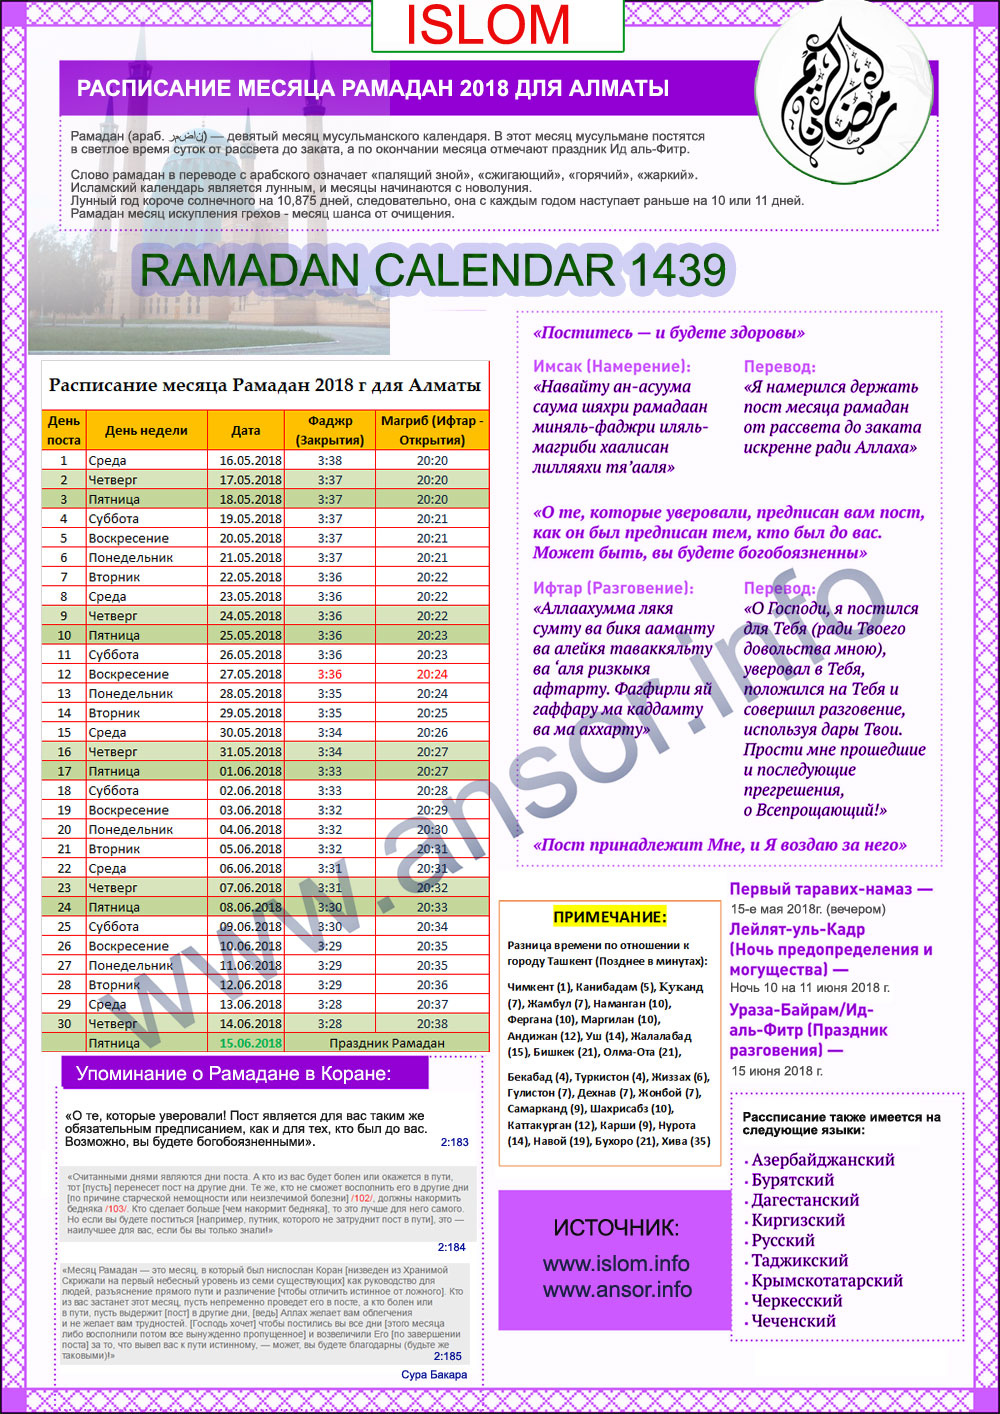 Расписание рамадан алмата 2018 казахстан